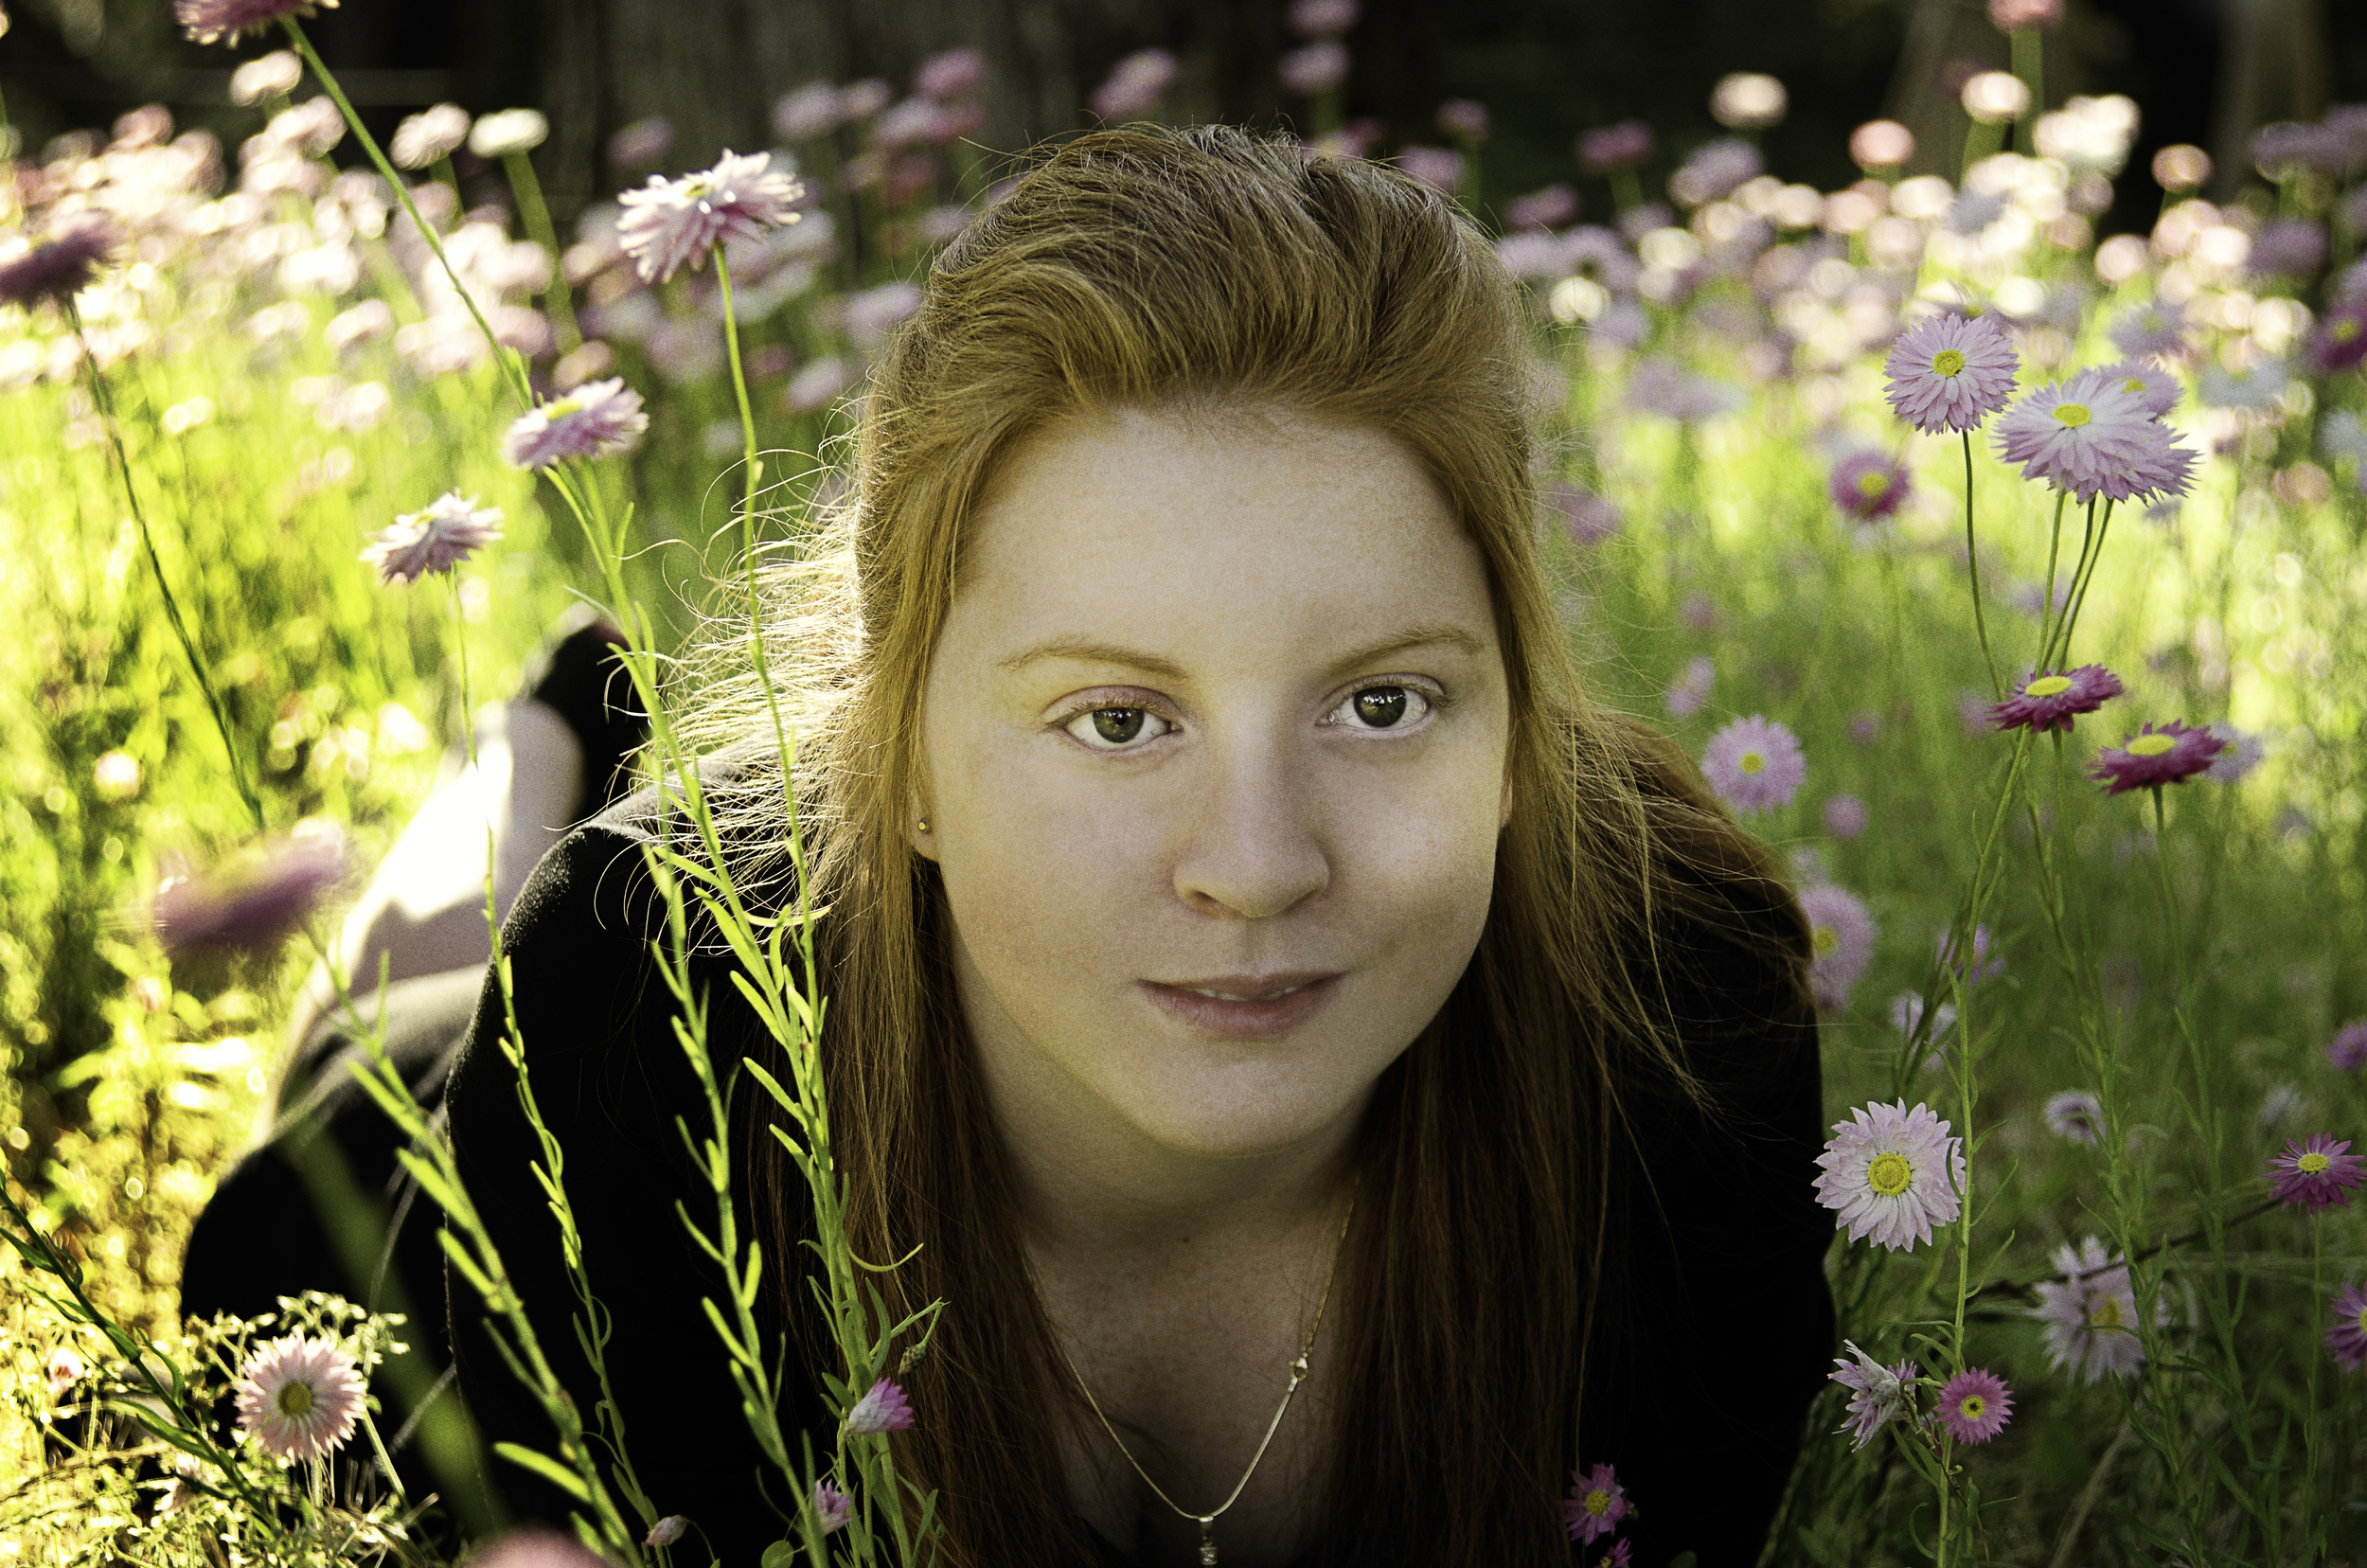 Scar Stories Hayley Retinoblastoma by Fiona Vail.jpg